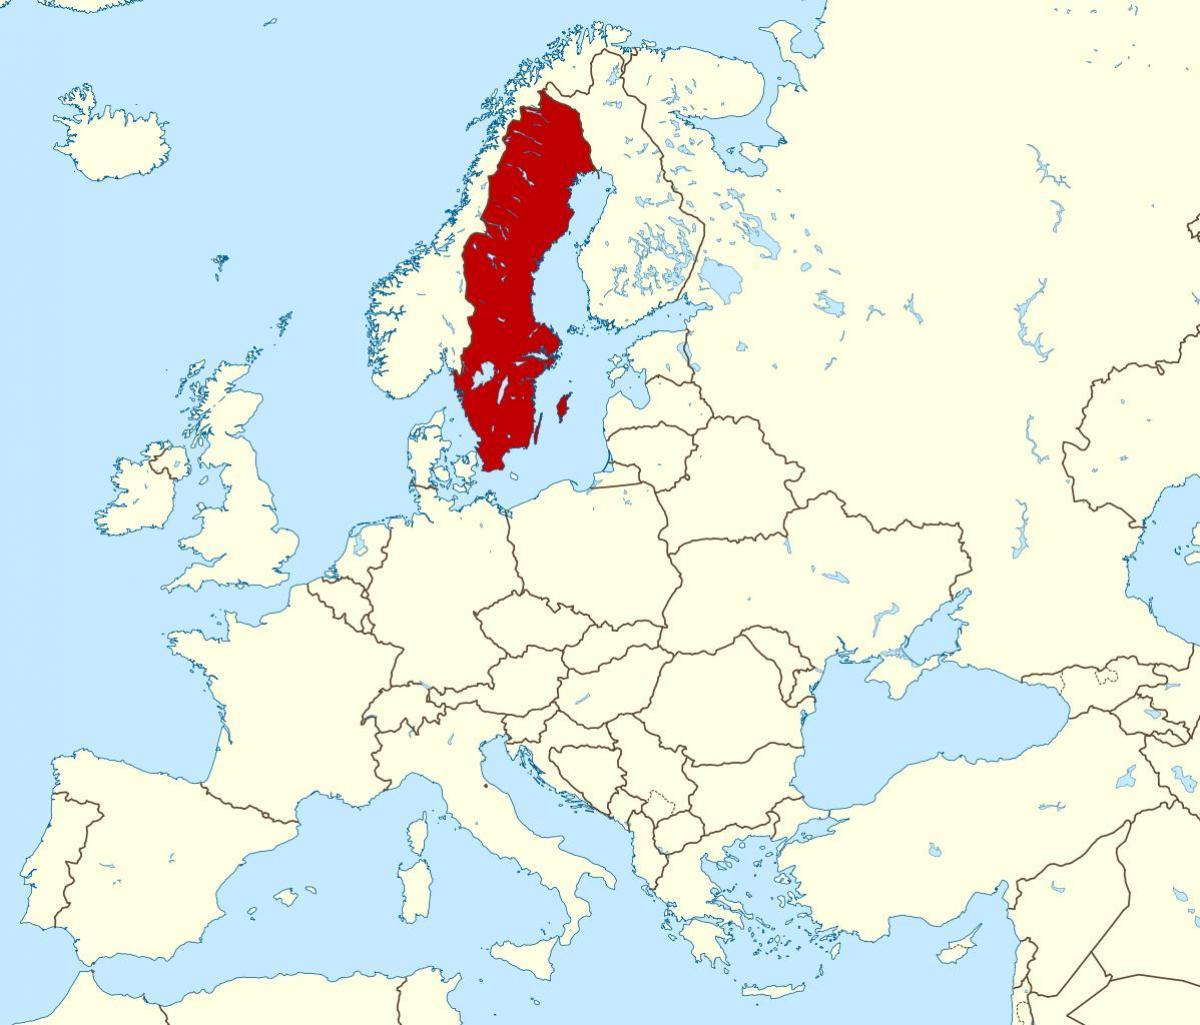 En suède, la carte de l'Europe   Carte de la Suède en Europe (l